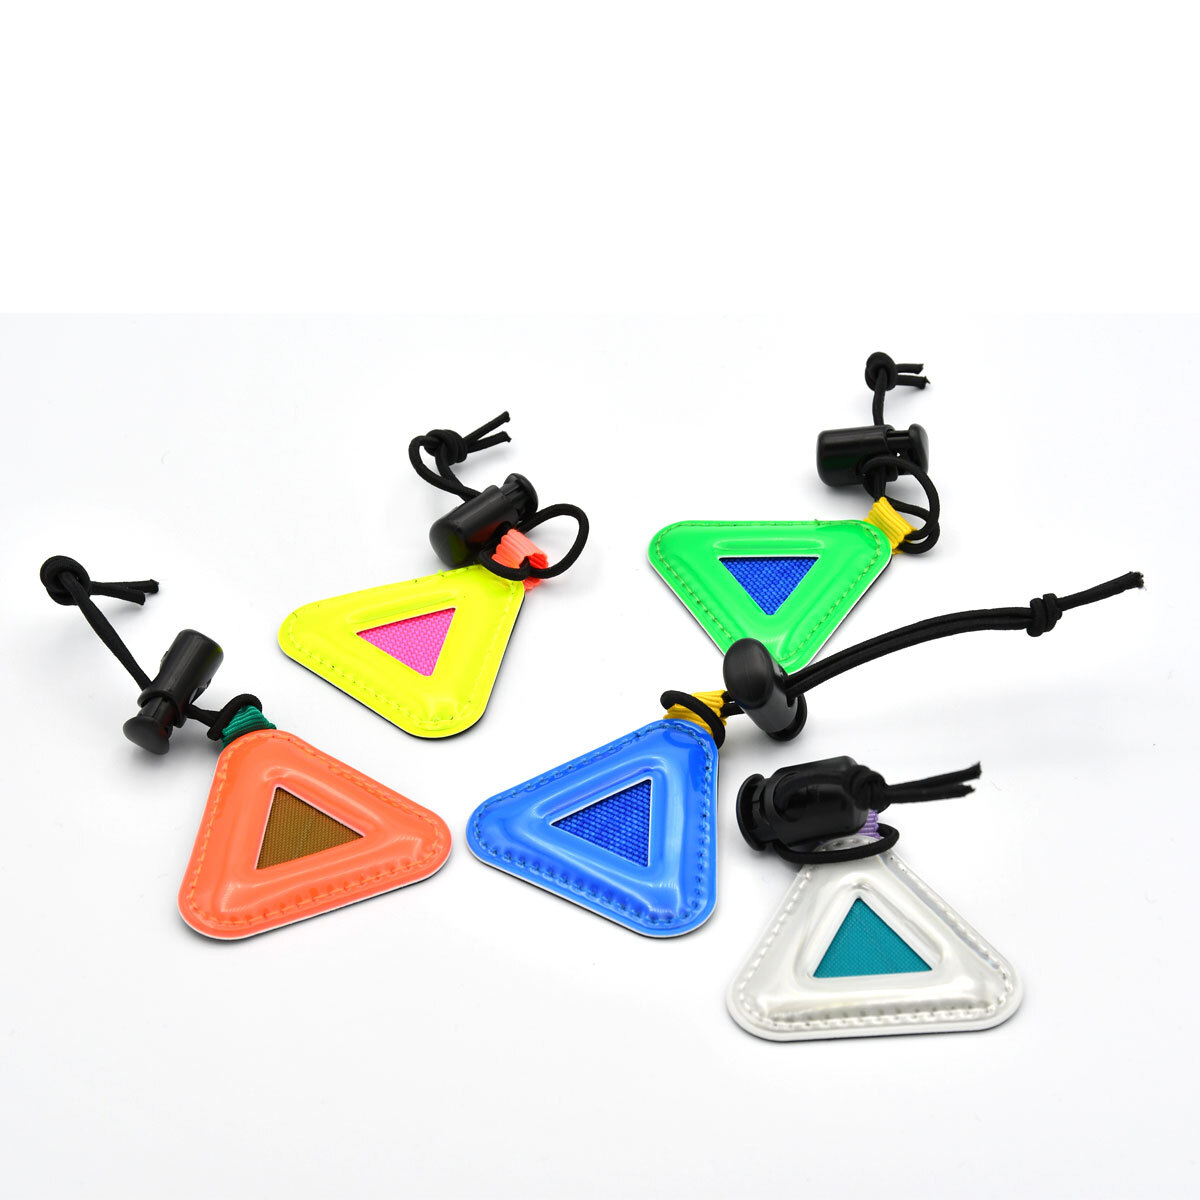 BLUELUG triangle reflector MINI ブルーラグ トライアングルリフレクターミニ